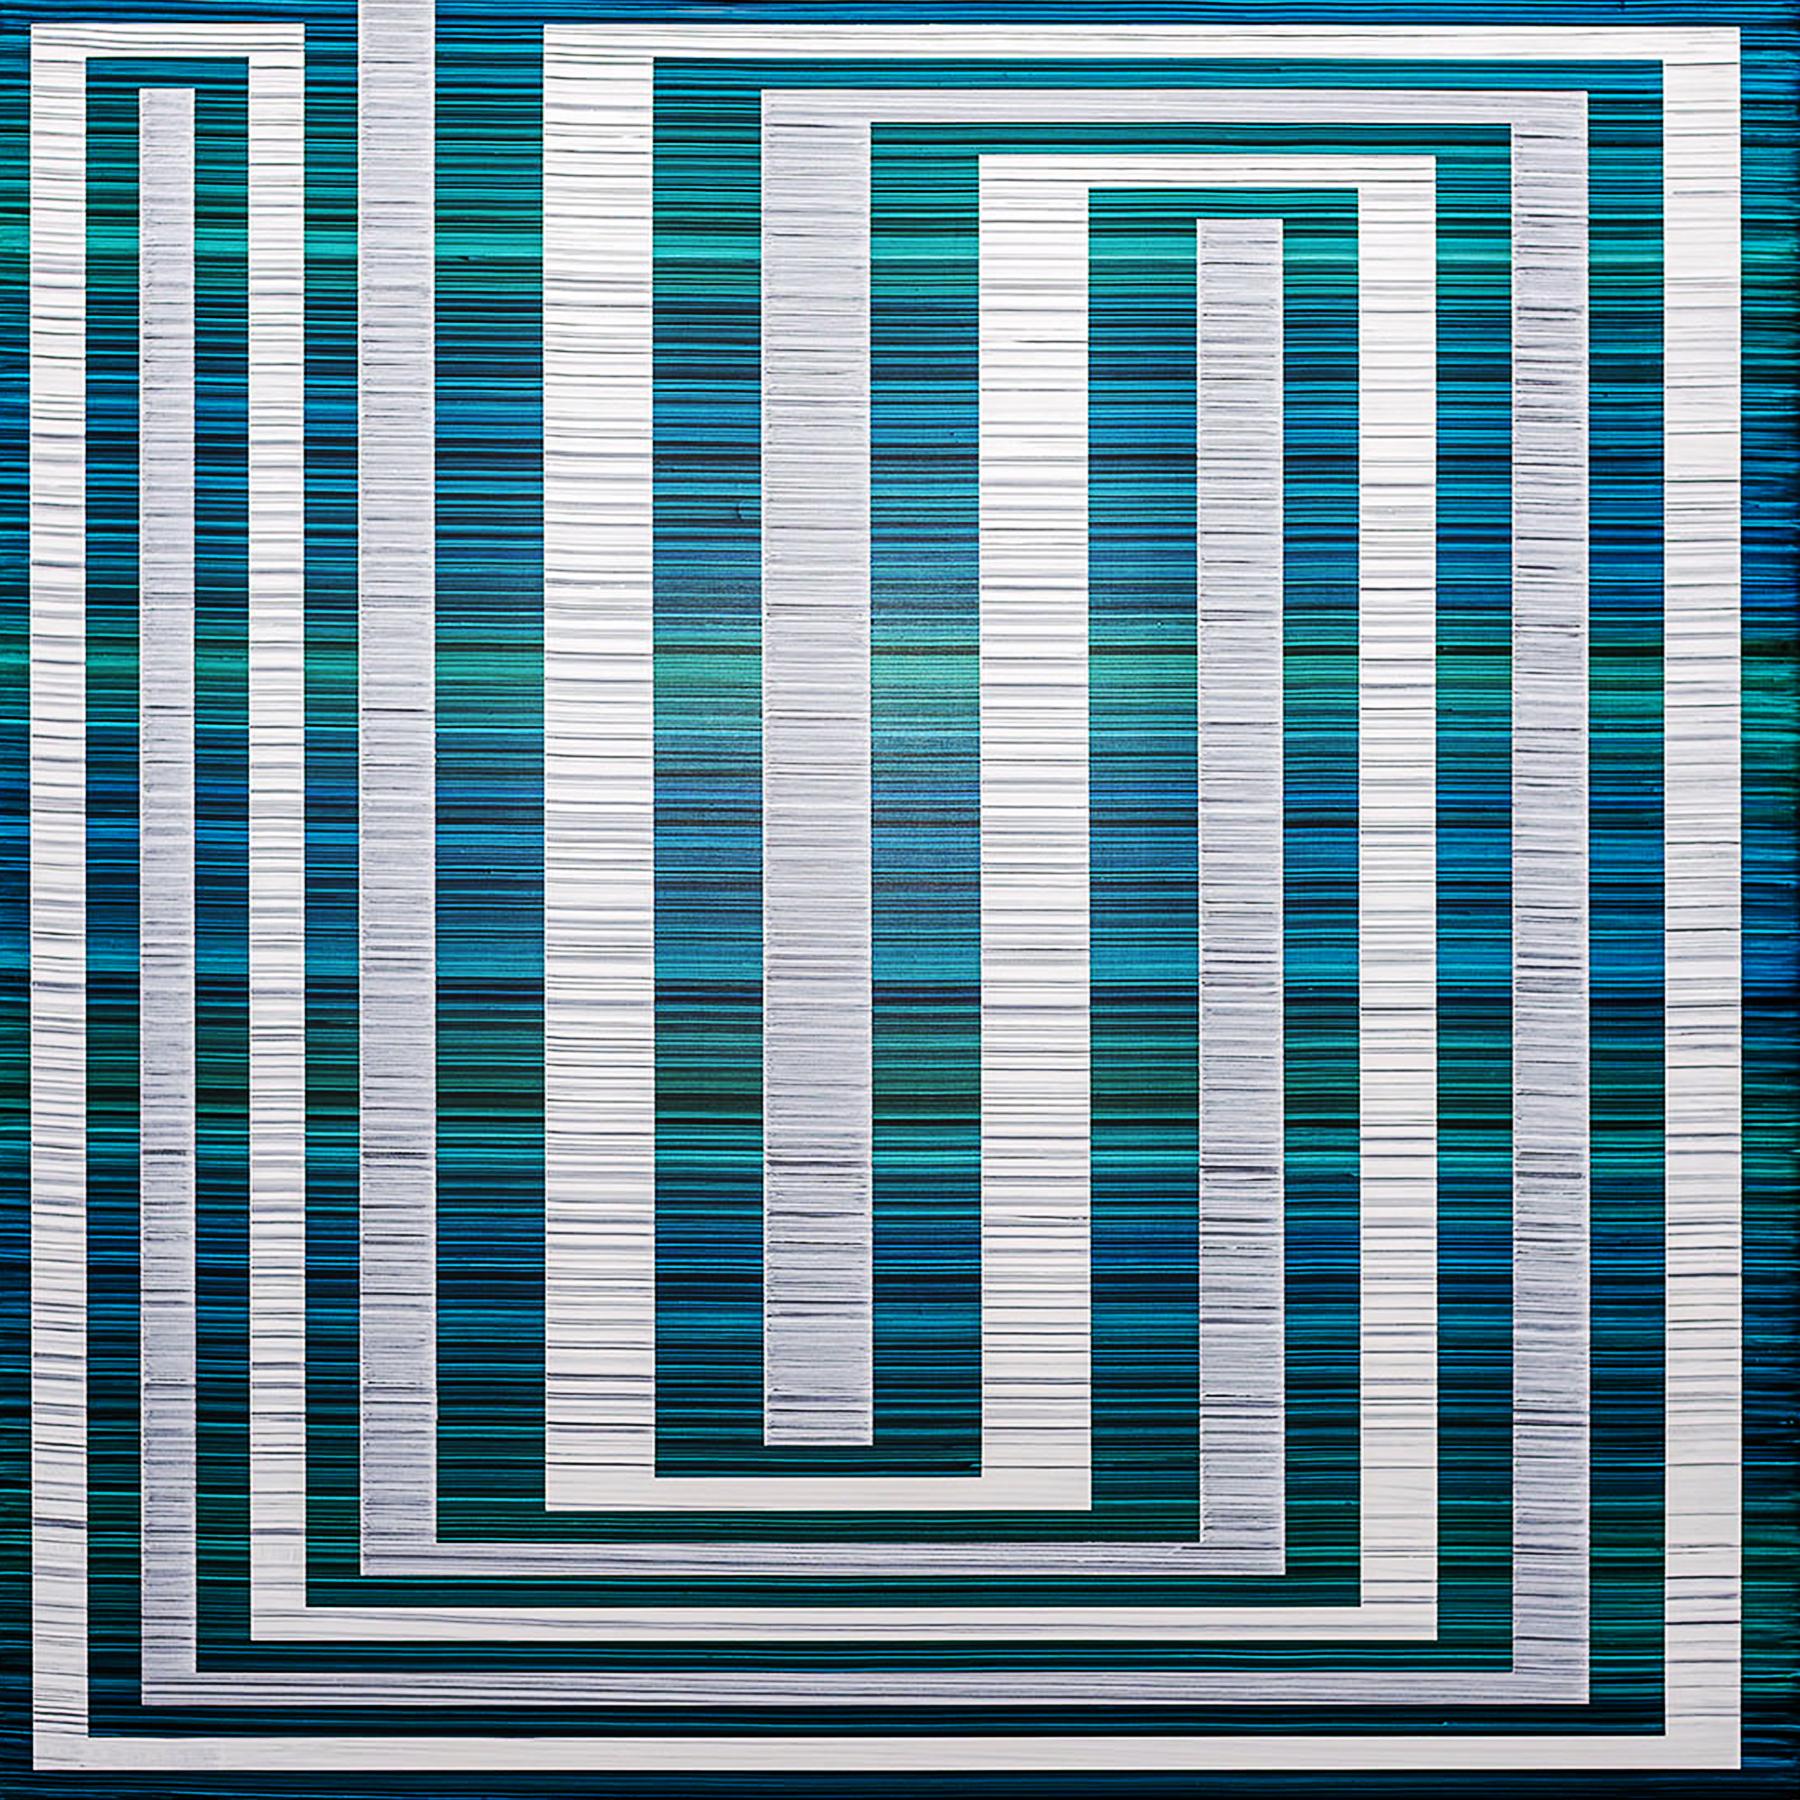 Bandwidth (Naiad), 40 x 40 inches / 101.6 x 101.6 cm, acrylic on muslin on panel, 2019